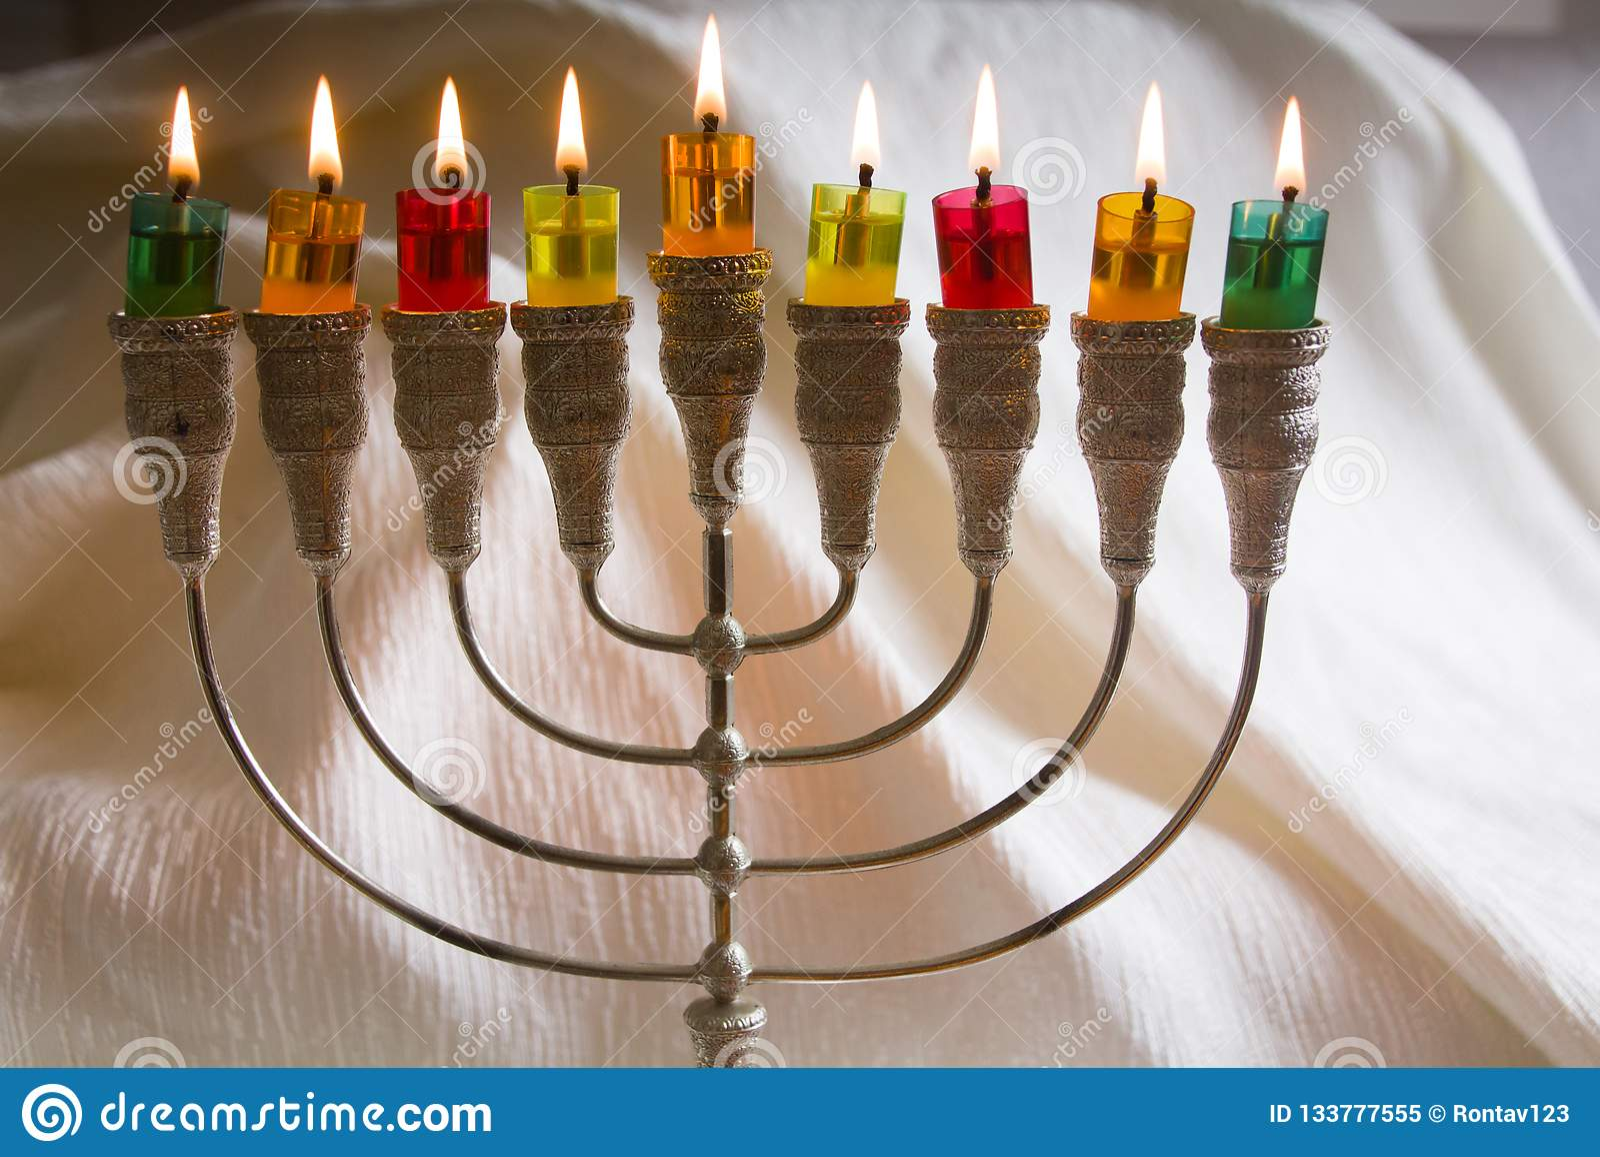 Simbolo ebreo di Chanukah di festa - i candelabri tradizionali di Menorah e le candele brucianti